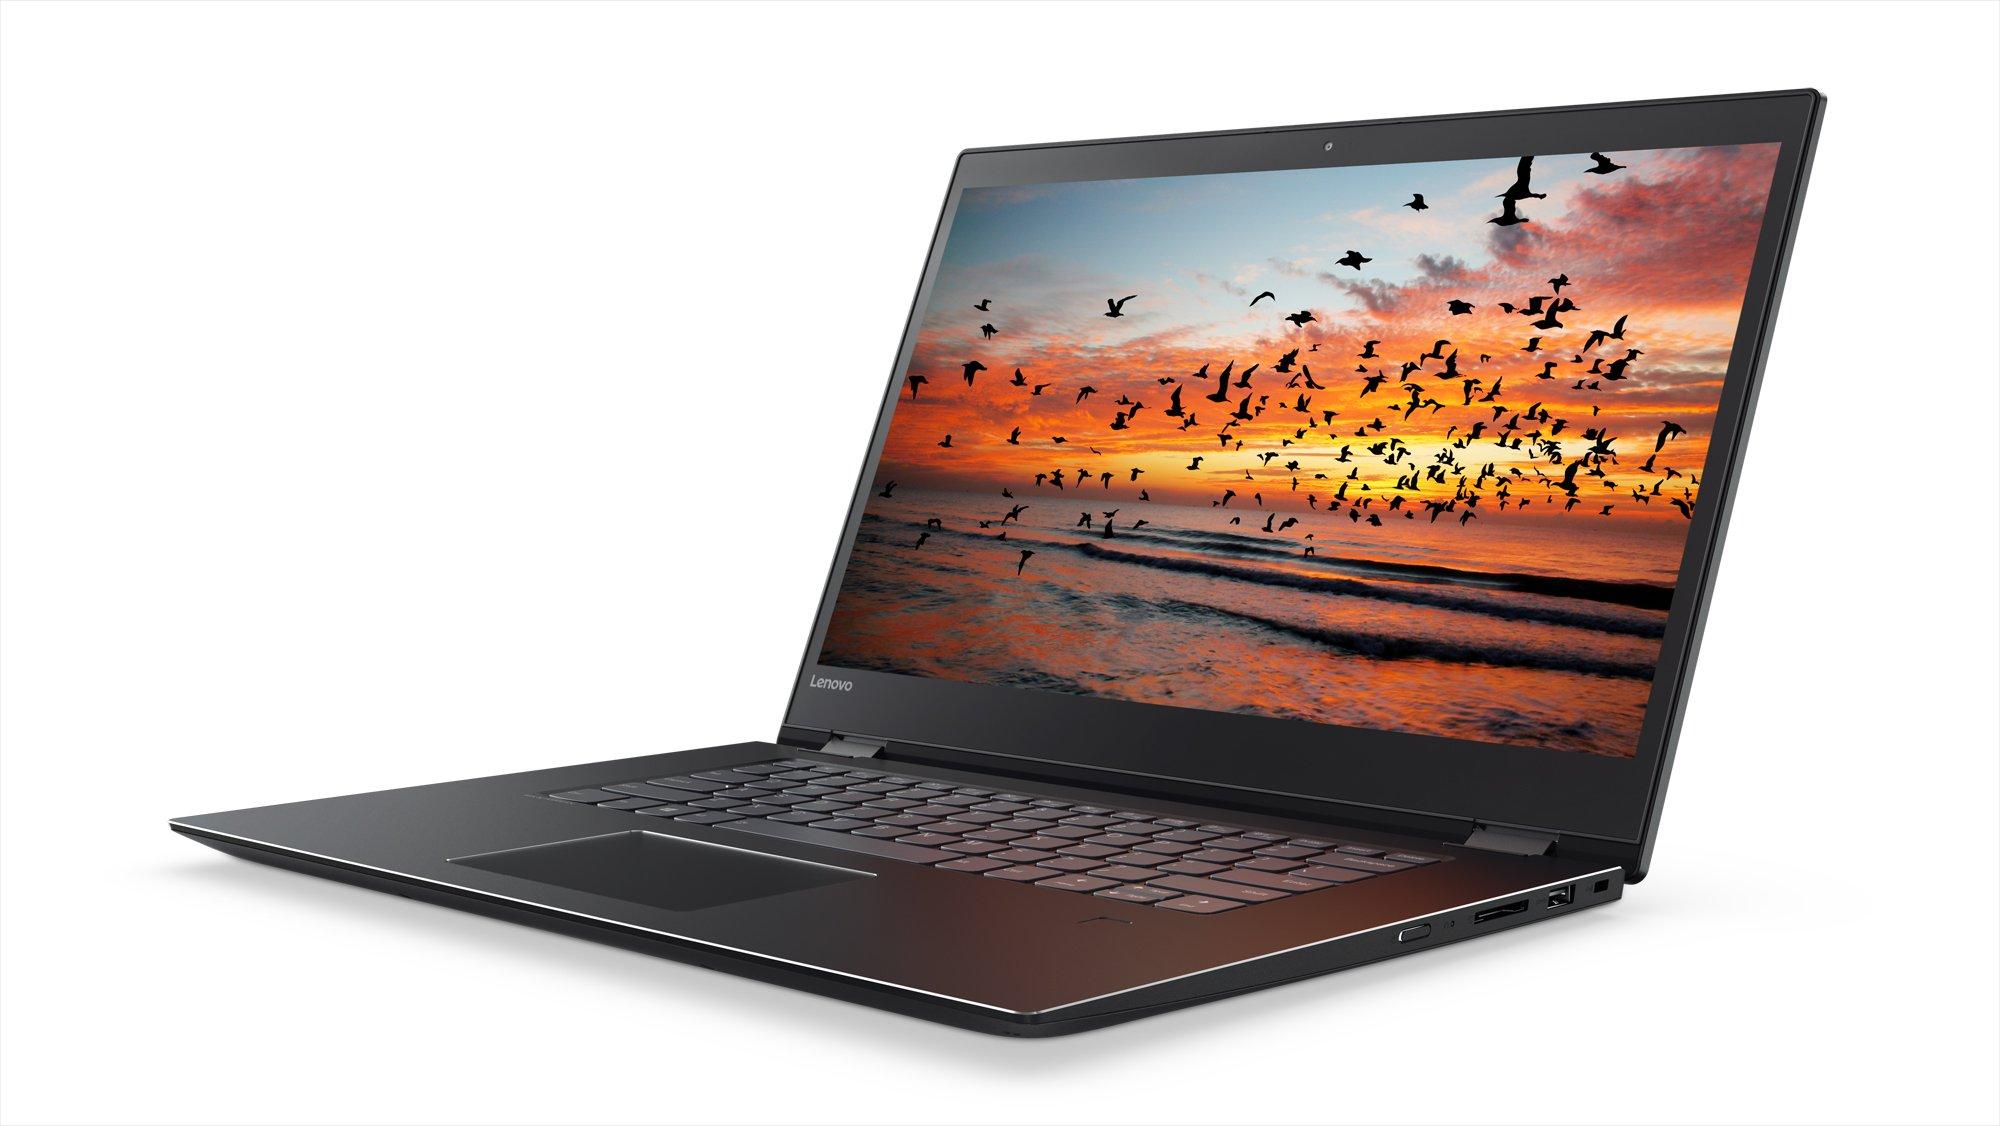 Lenovo Flex 5 15.6-Inch 2-in-1 Laptop, (Intel Core i5-8250U 8GB DDR4 256GB PCIe SSD Windows 10) 81CA0008US